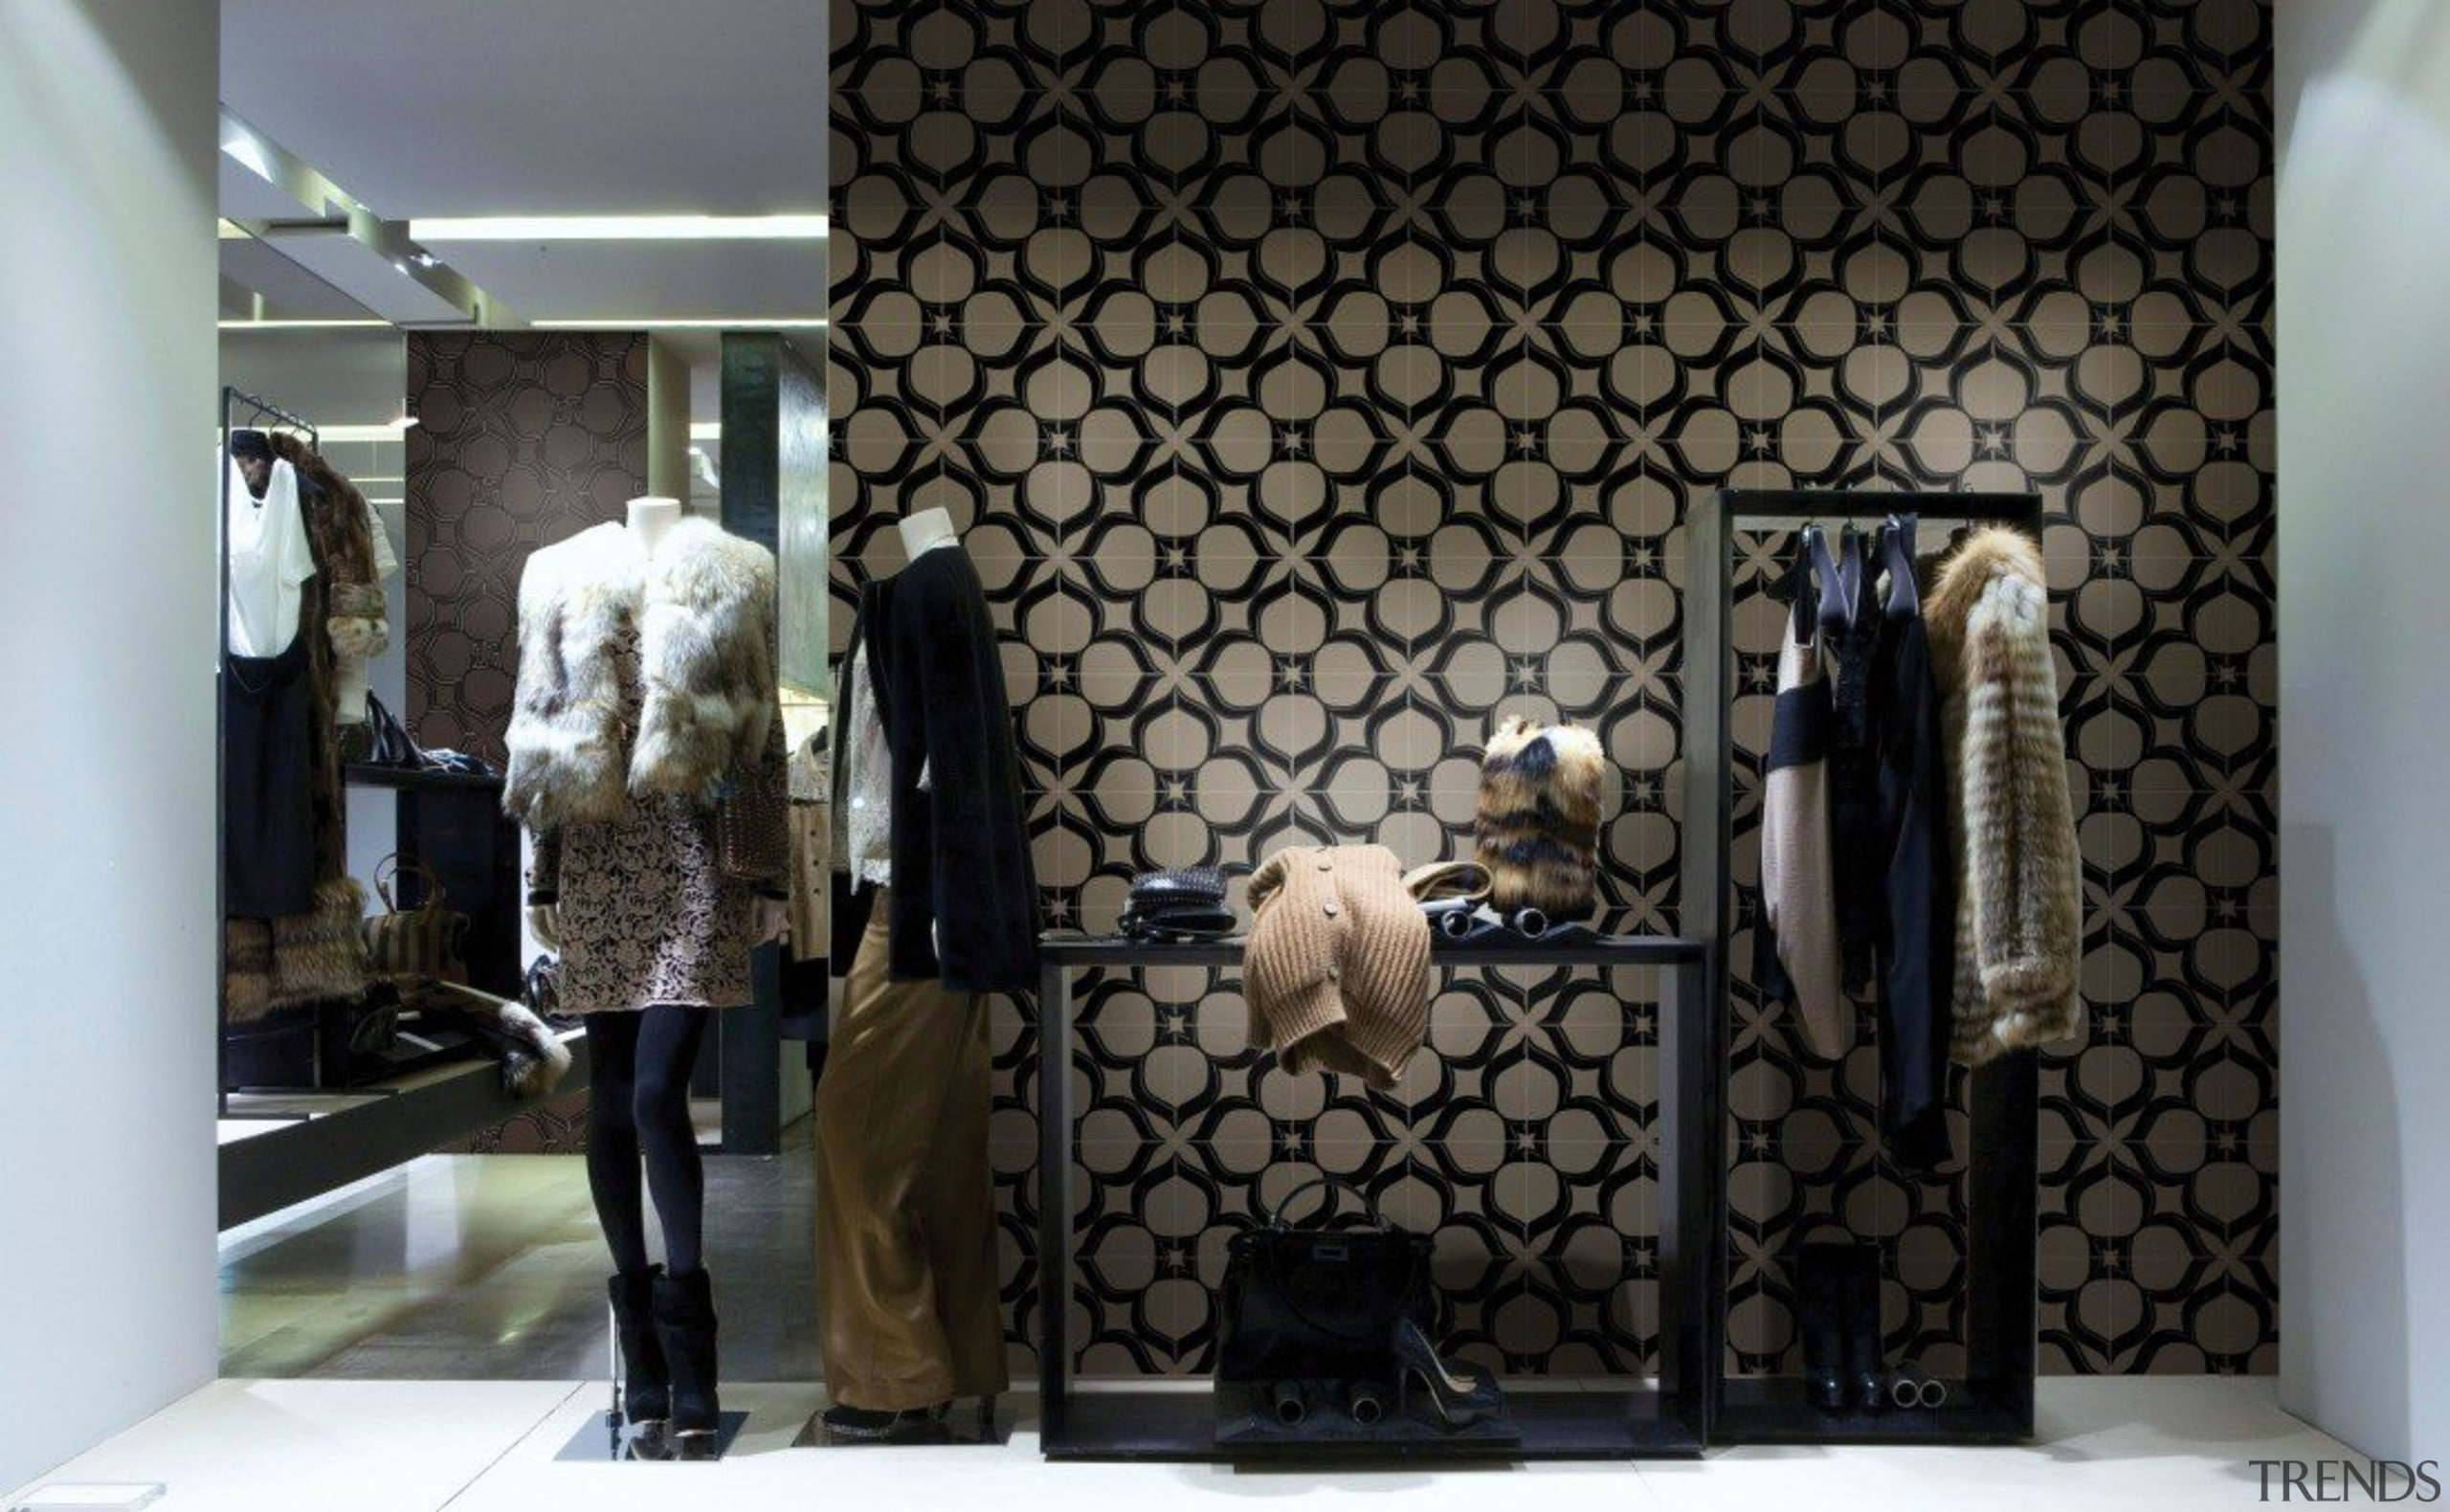 Ambient Touch - Ambient Touch - boutique | boutique, display window, furniture, interior design, room, window, black, gray